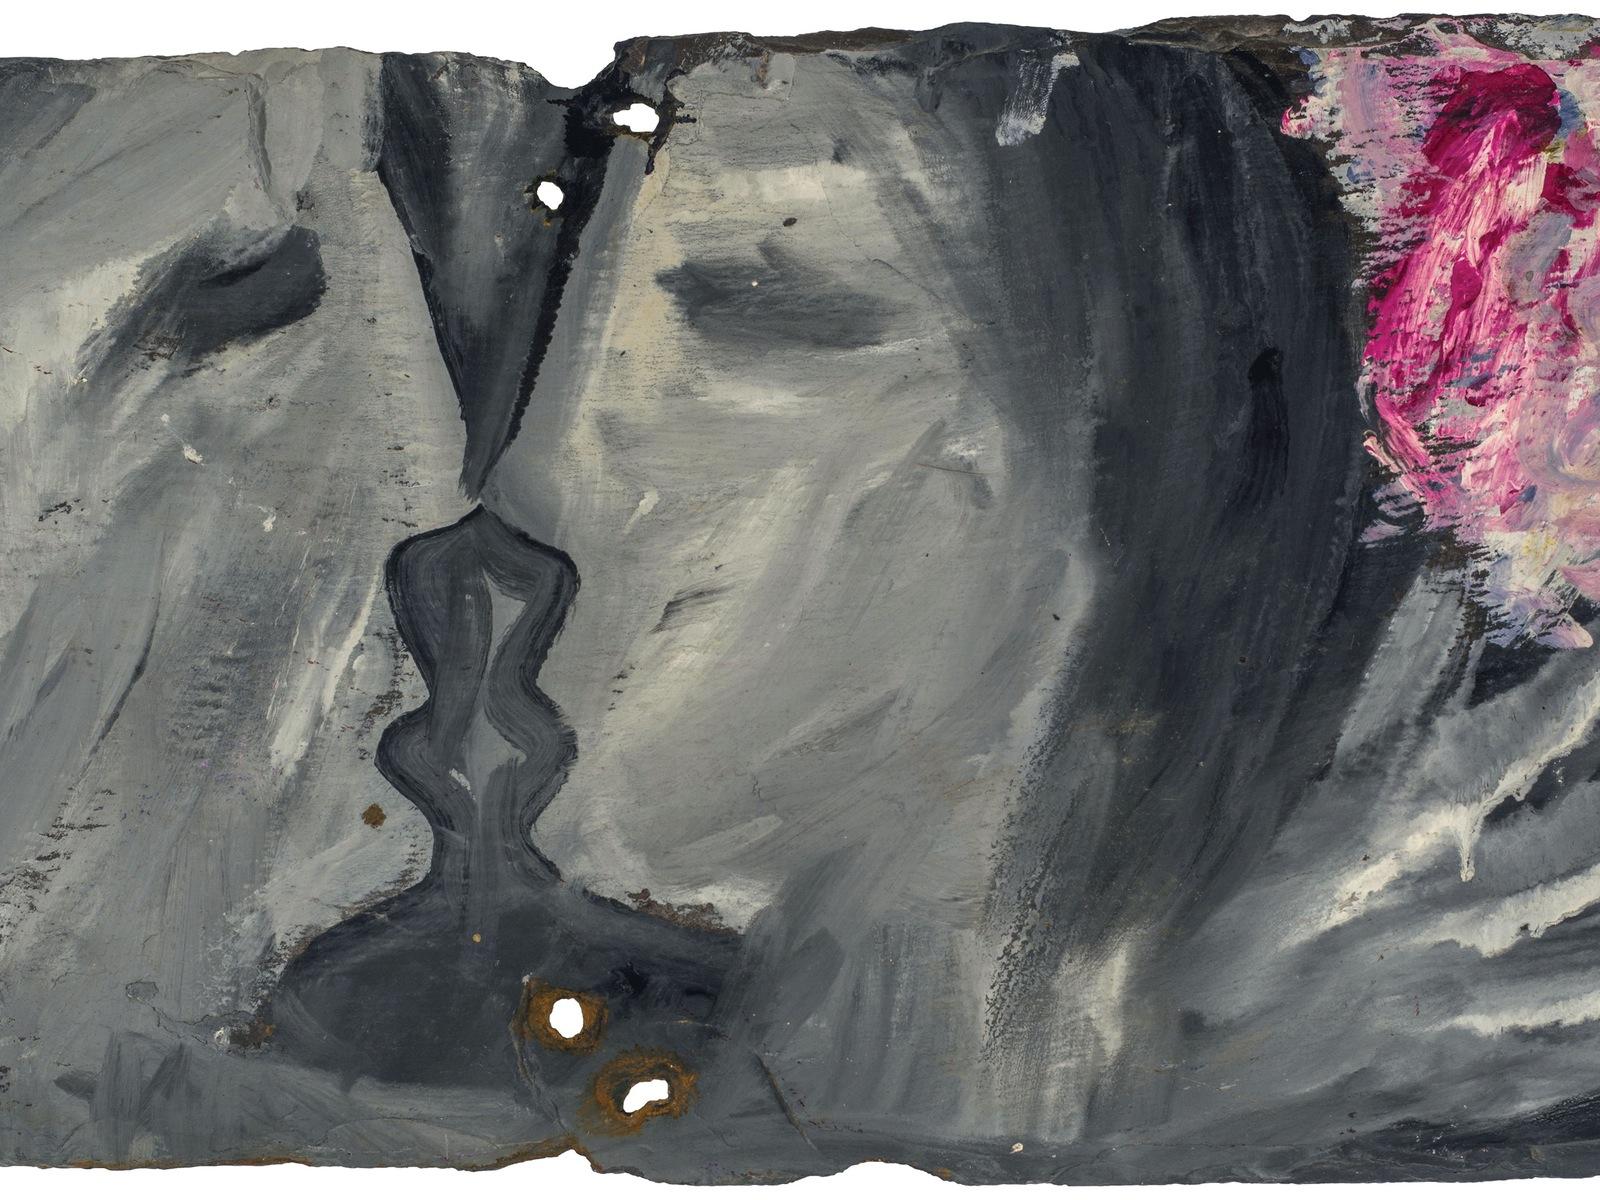 oil, enamel and ink on slate, 25.5 x 50.8 cm